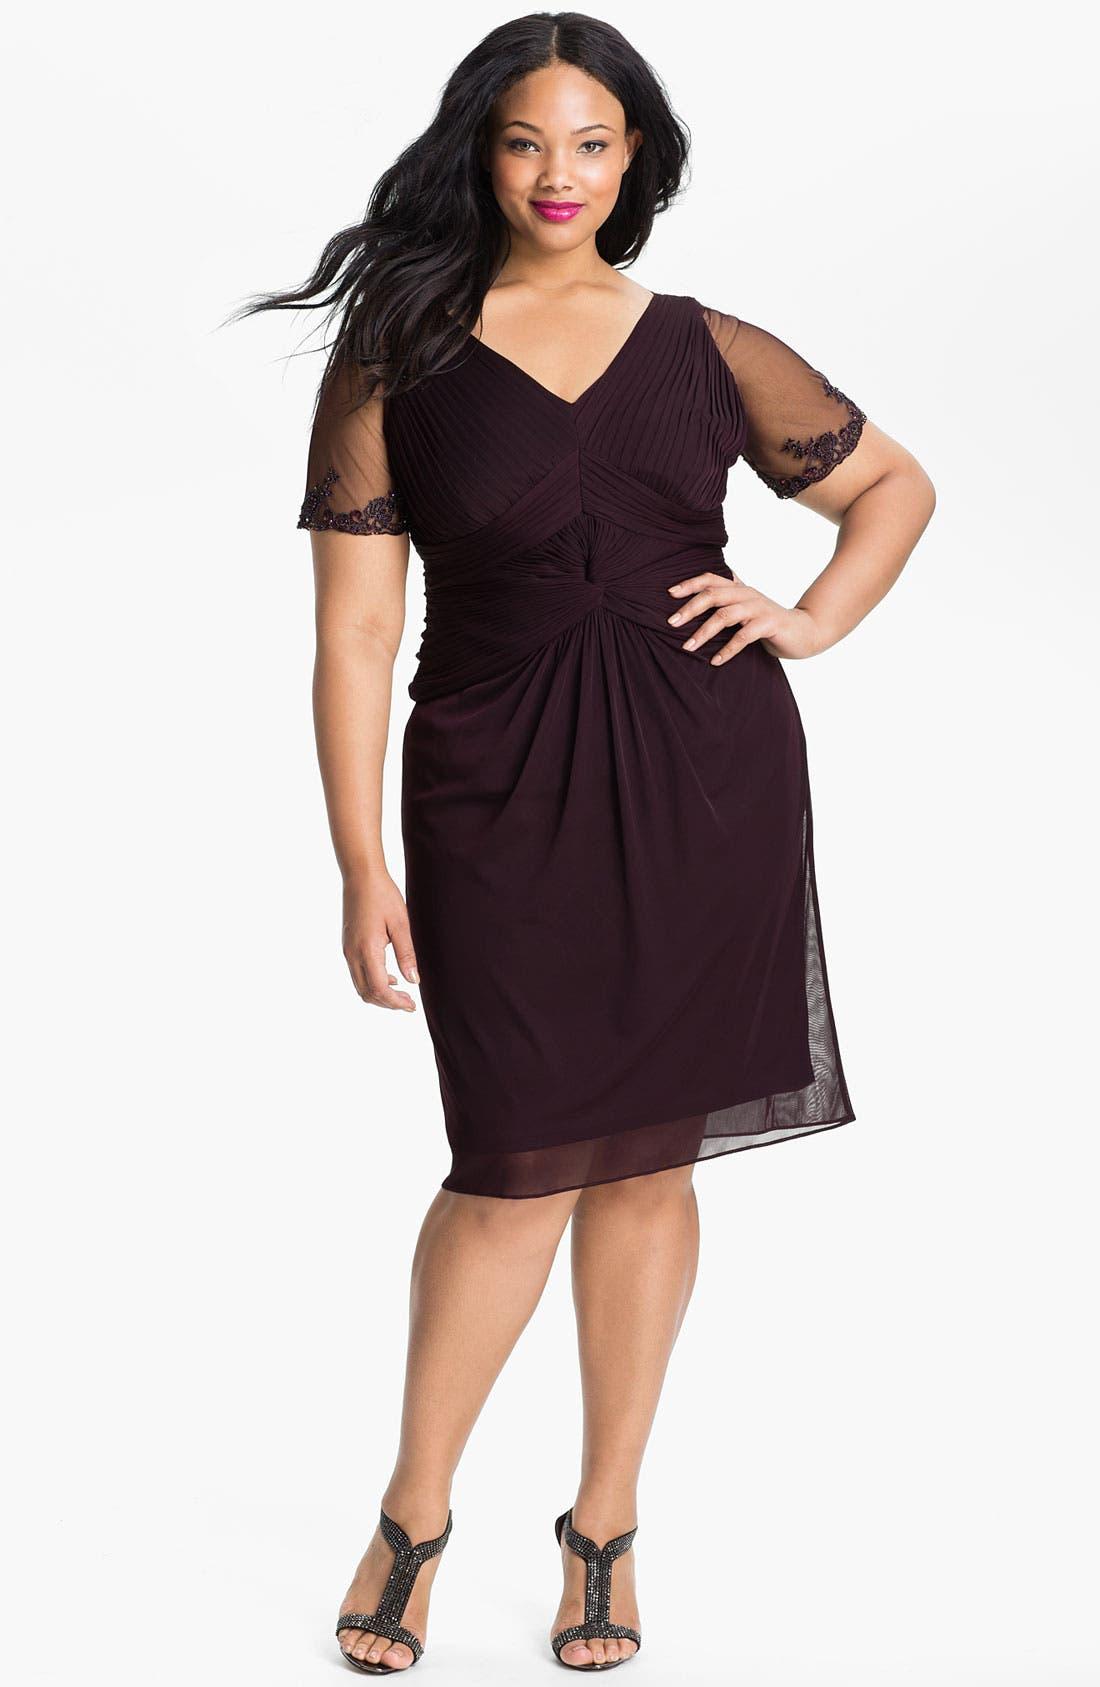 Alternate Image 1 Selected - Adrianna Papell Beaded Mesh Sheath Dress (Plus)